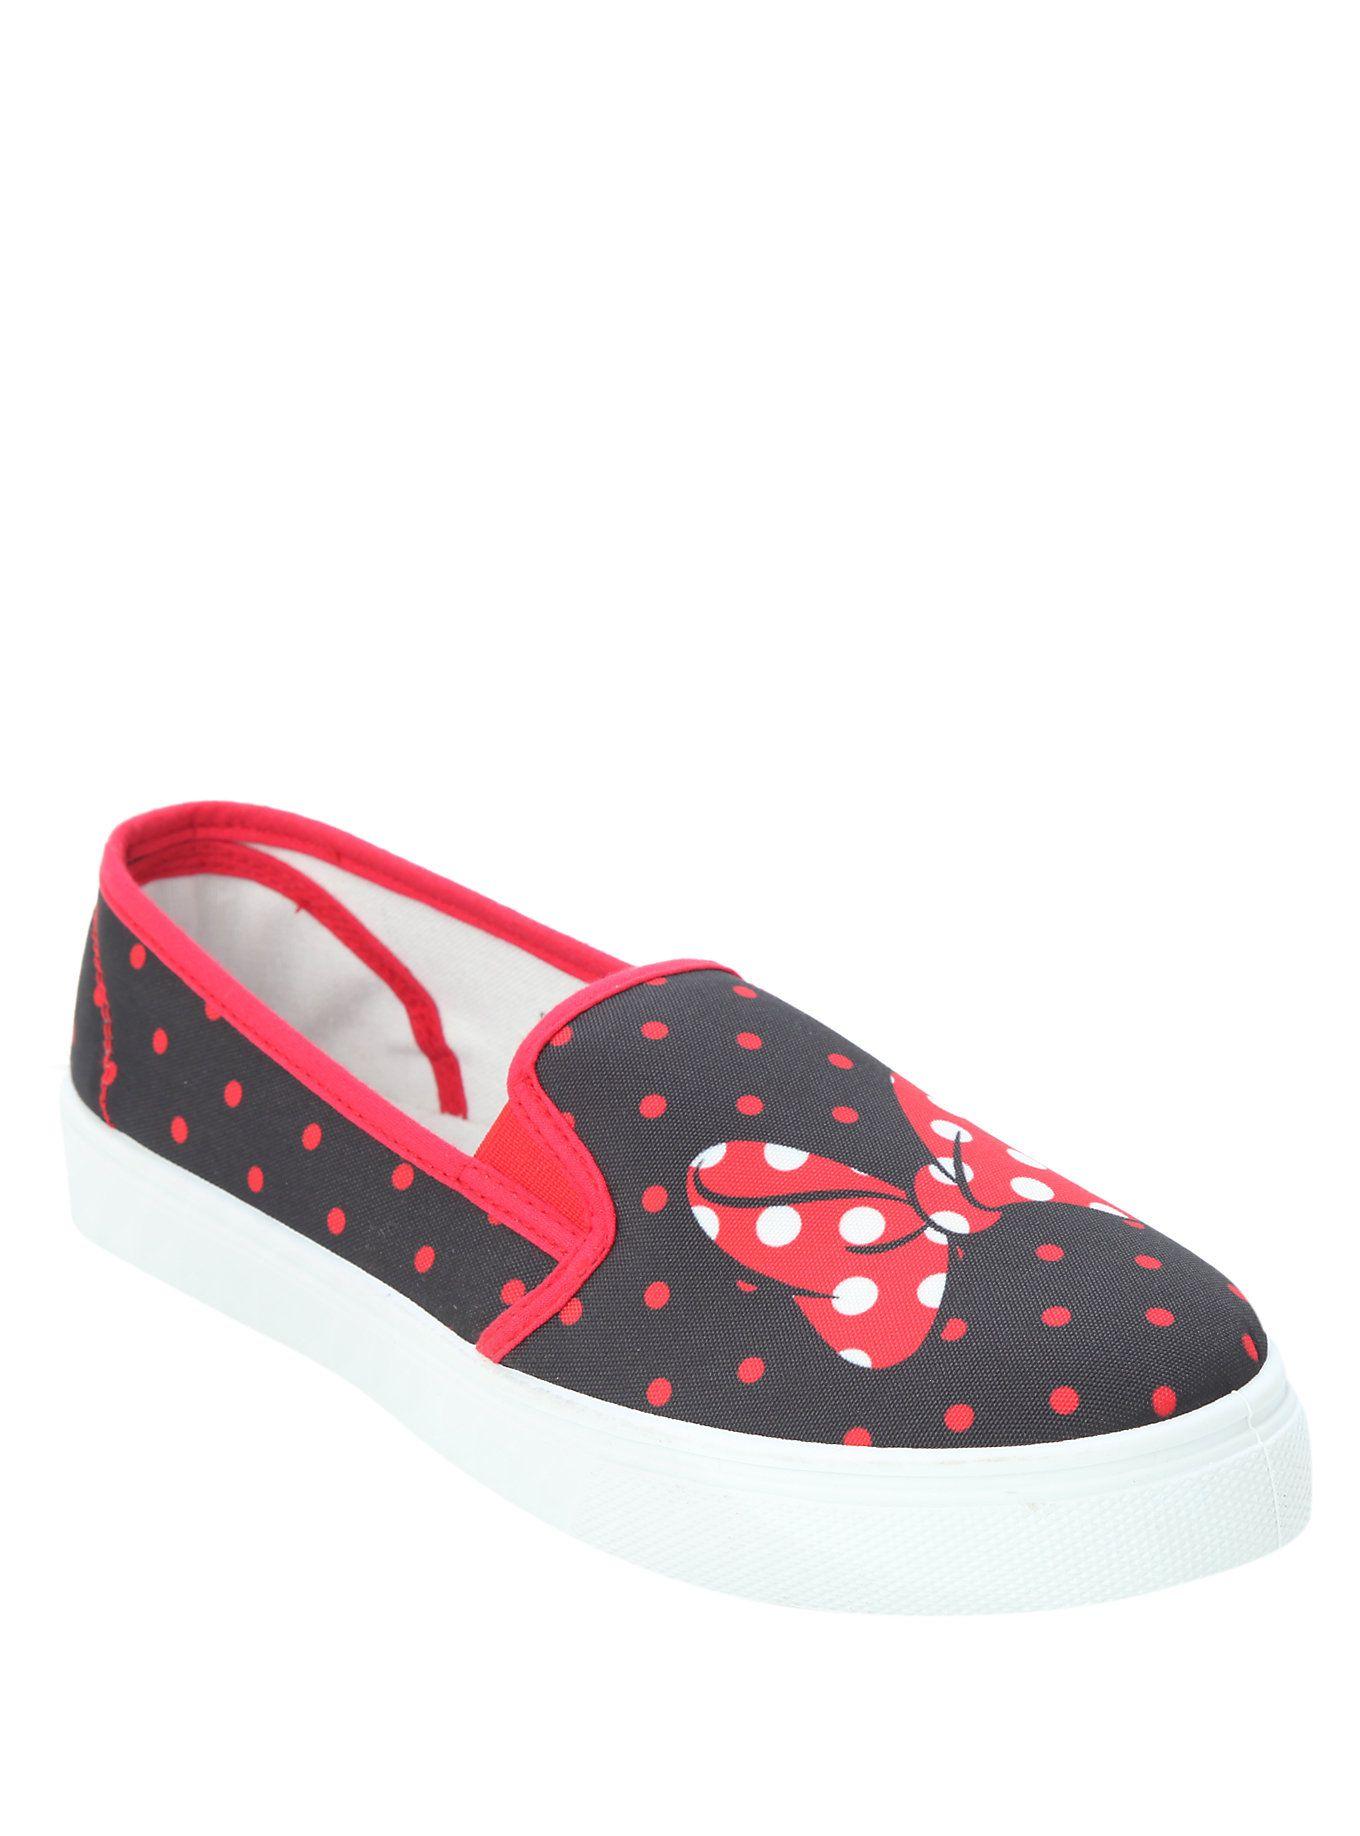 Disney Minnie Mouse Slip-On Sneakers, BLACK